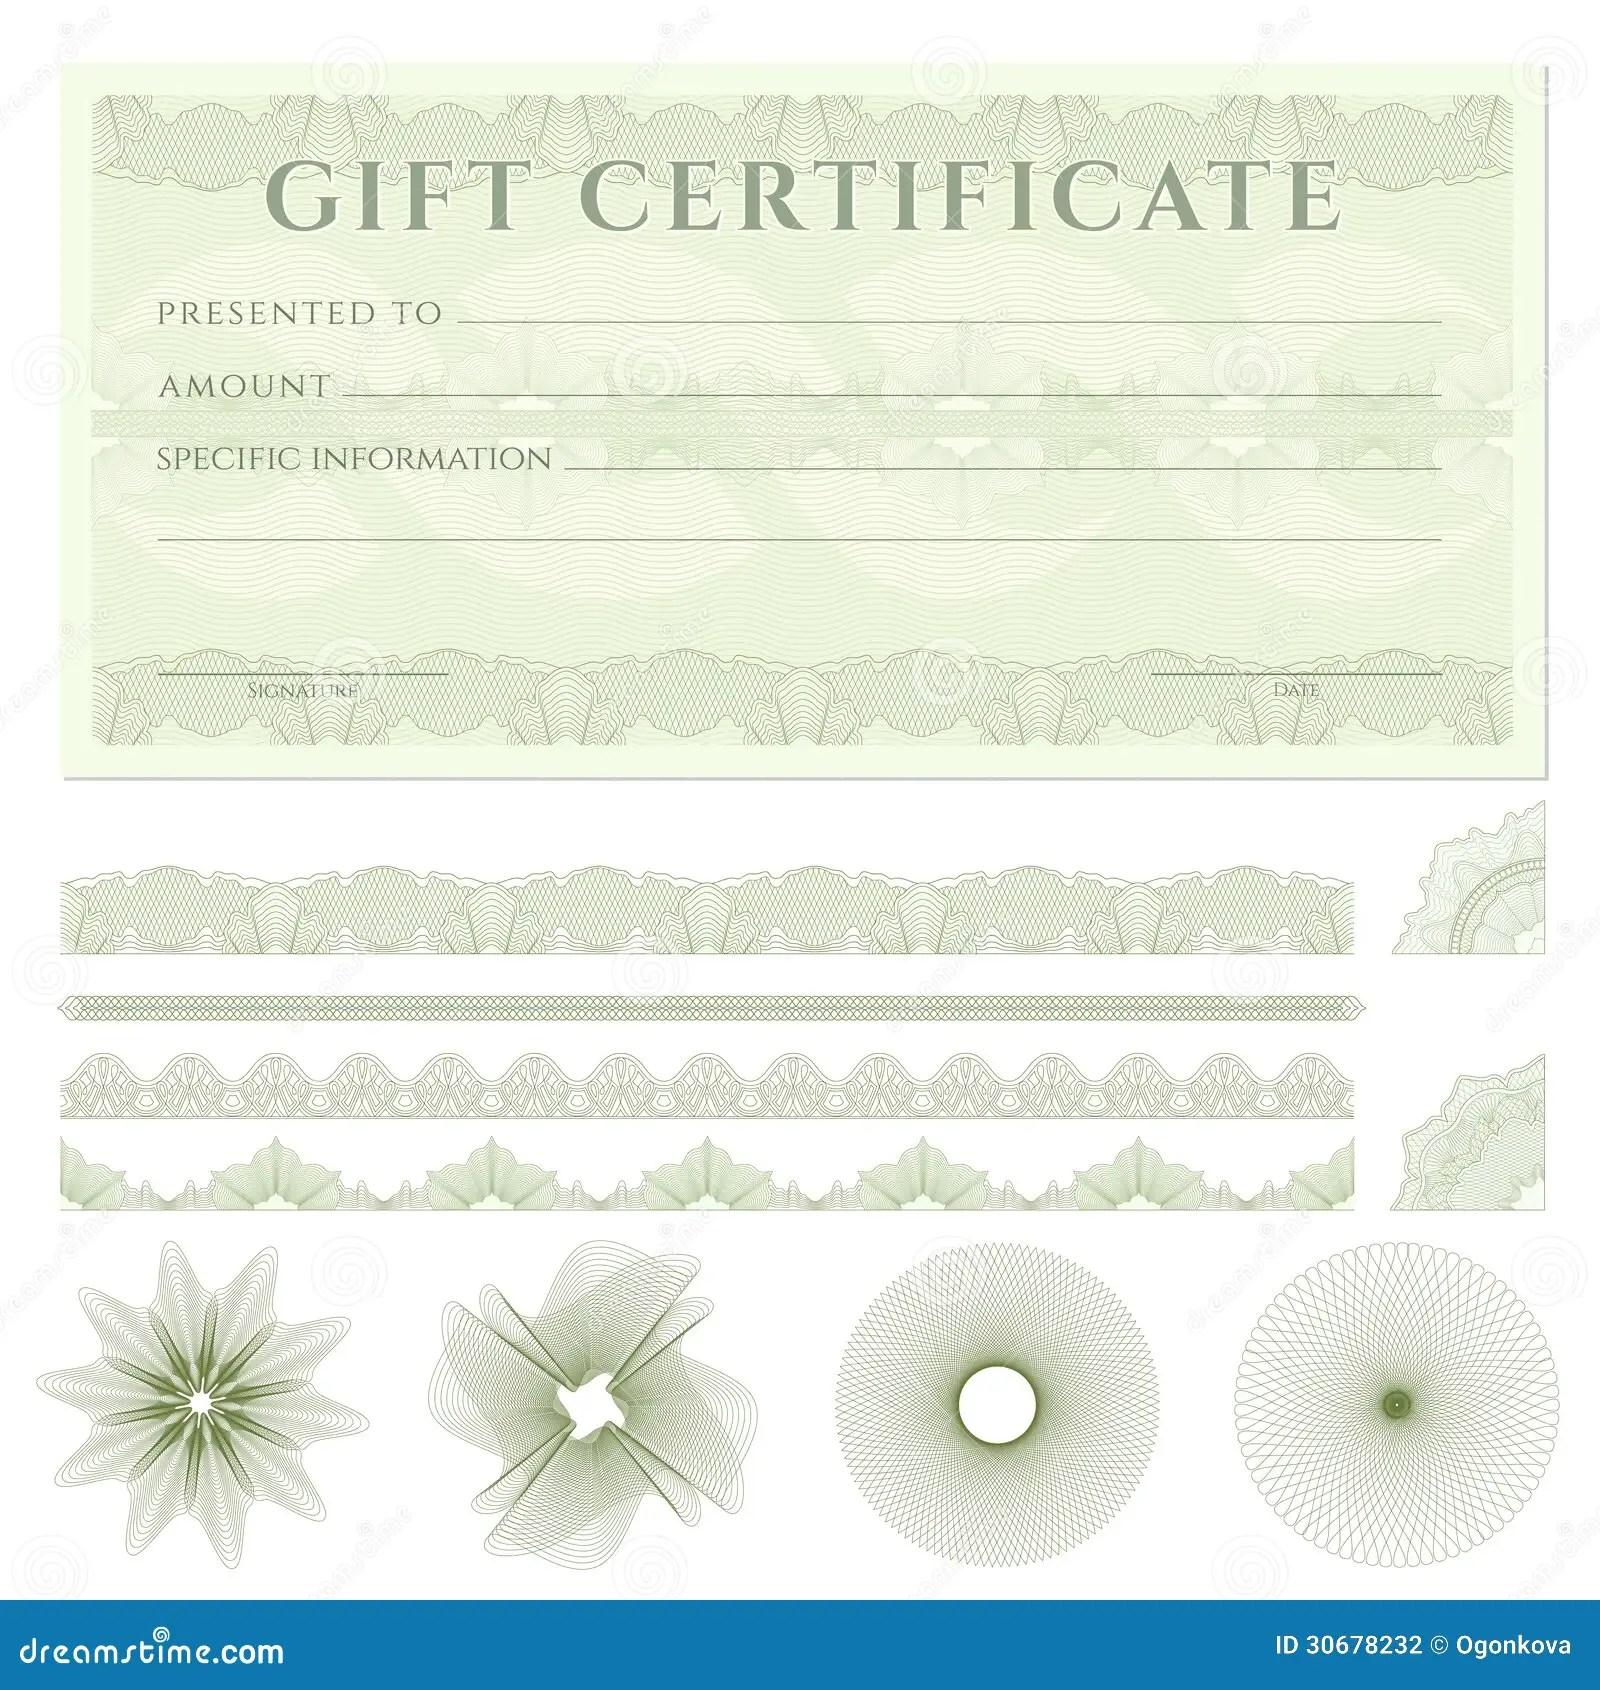 certificate template green resume builder certificate template green award certificates printable certificate templates gift certificate voucher template guilloche pattern